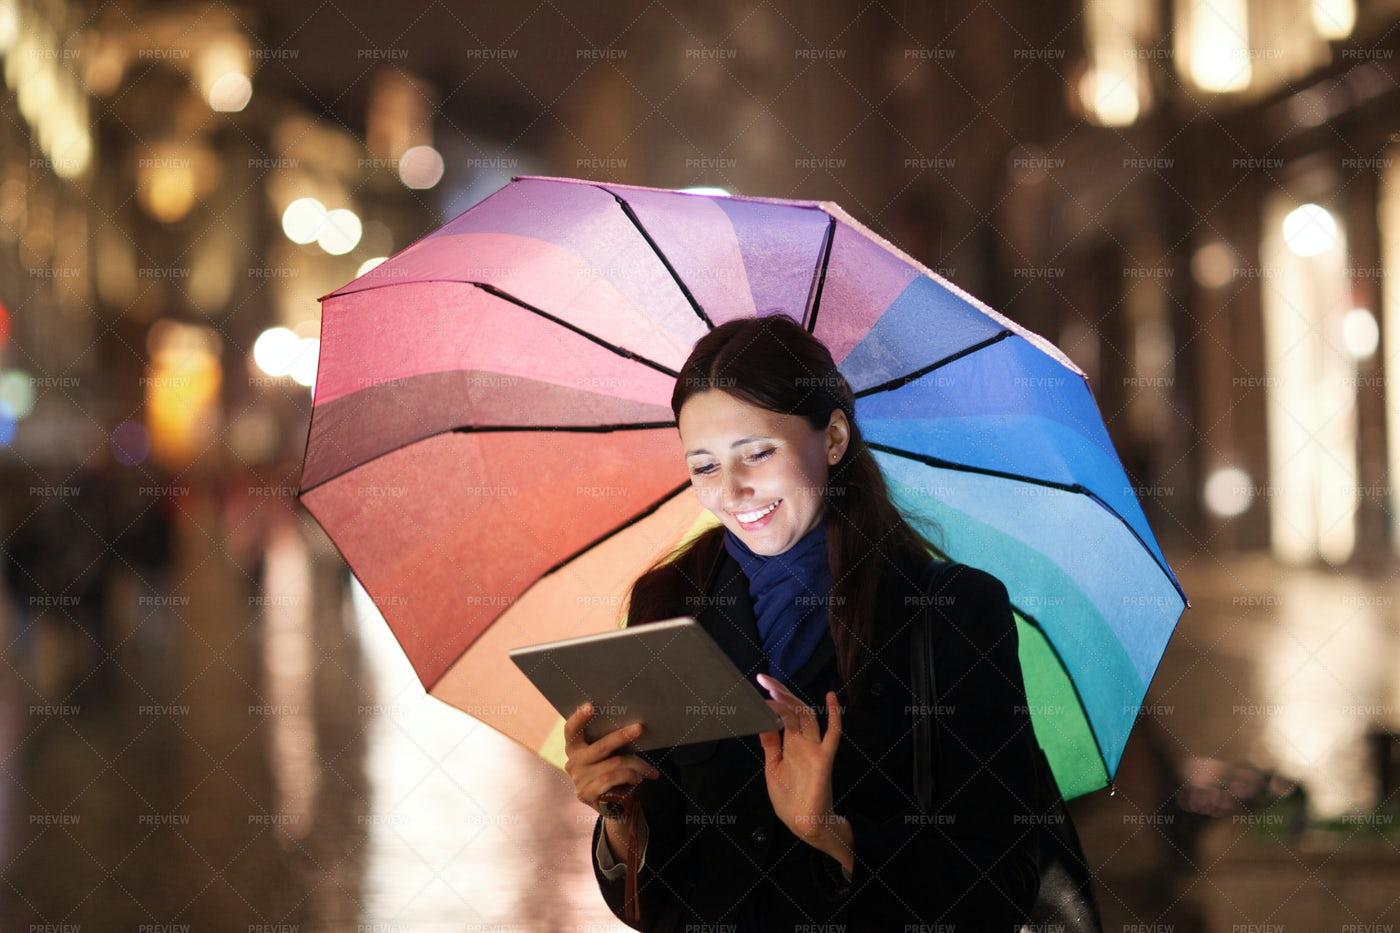 Using Ipad And Umbrella: Stock Photos